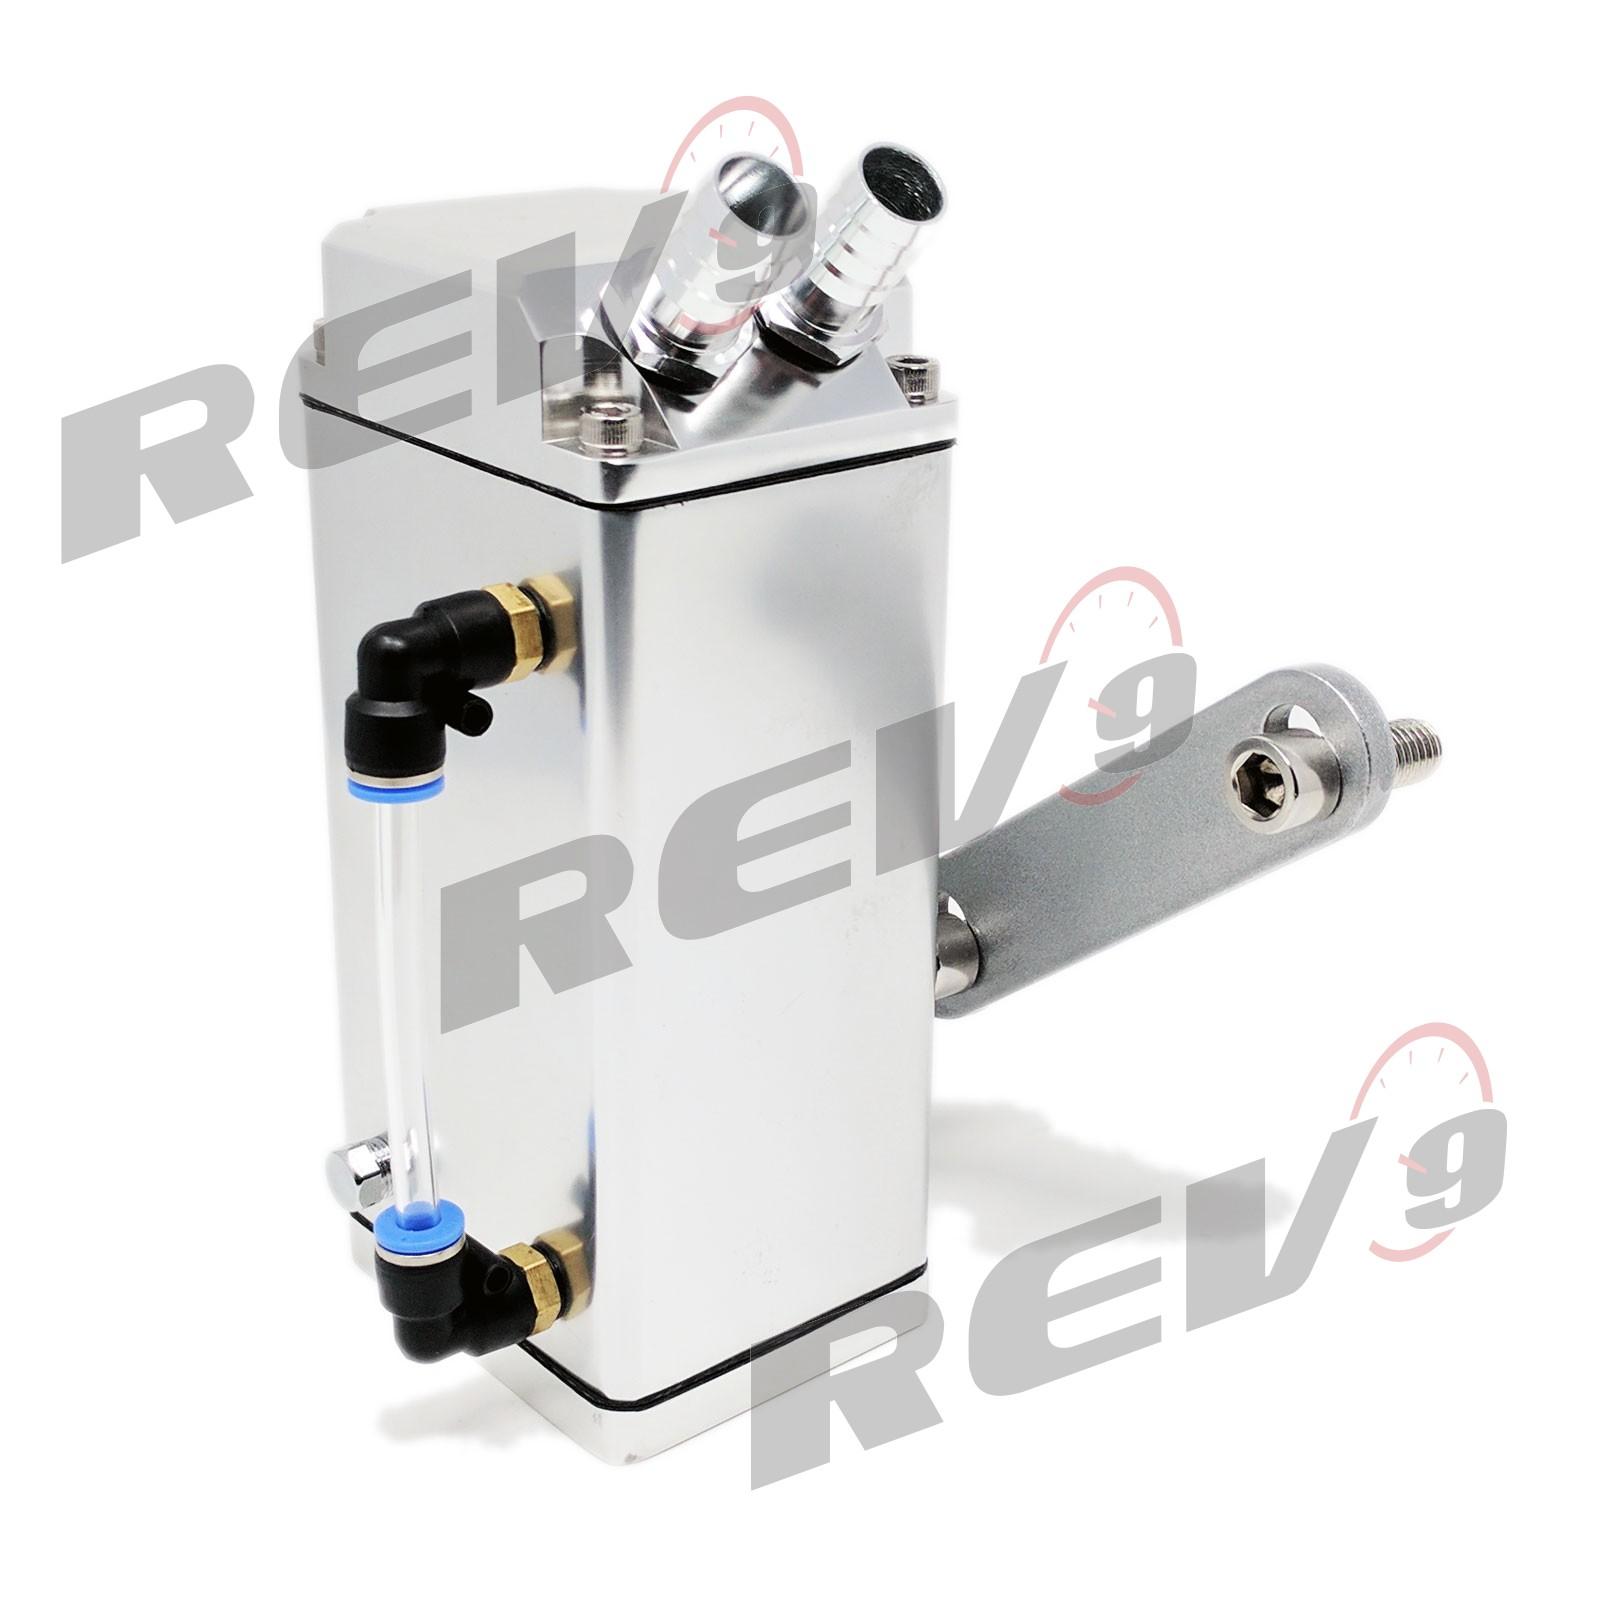 Ls1 Engine Description: Rev9 LS Engine Oil Catch Can LS1, LS2, LS3, LS6